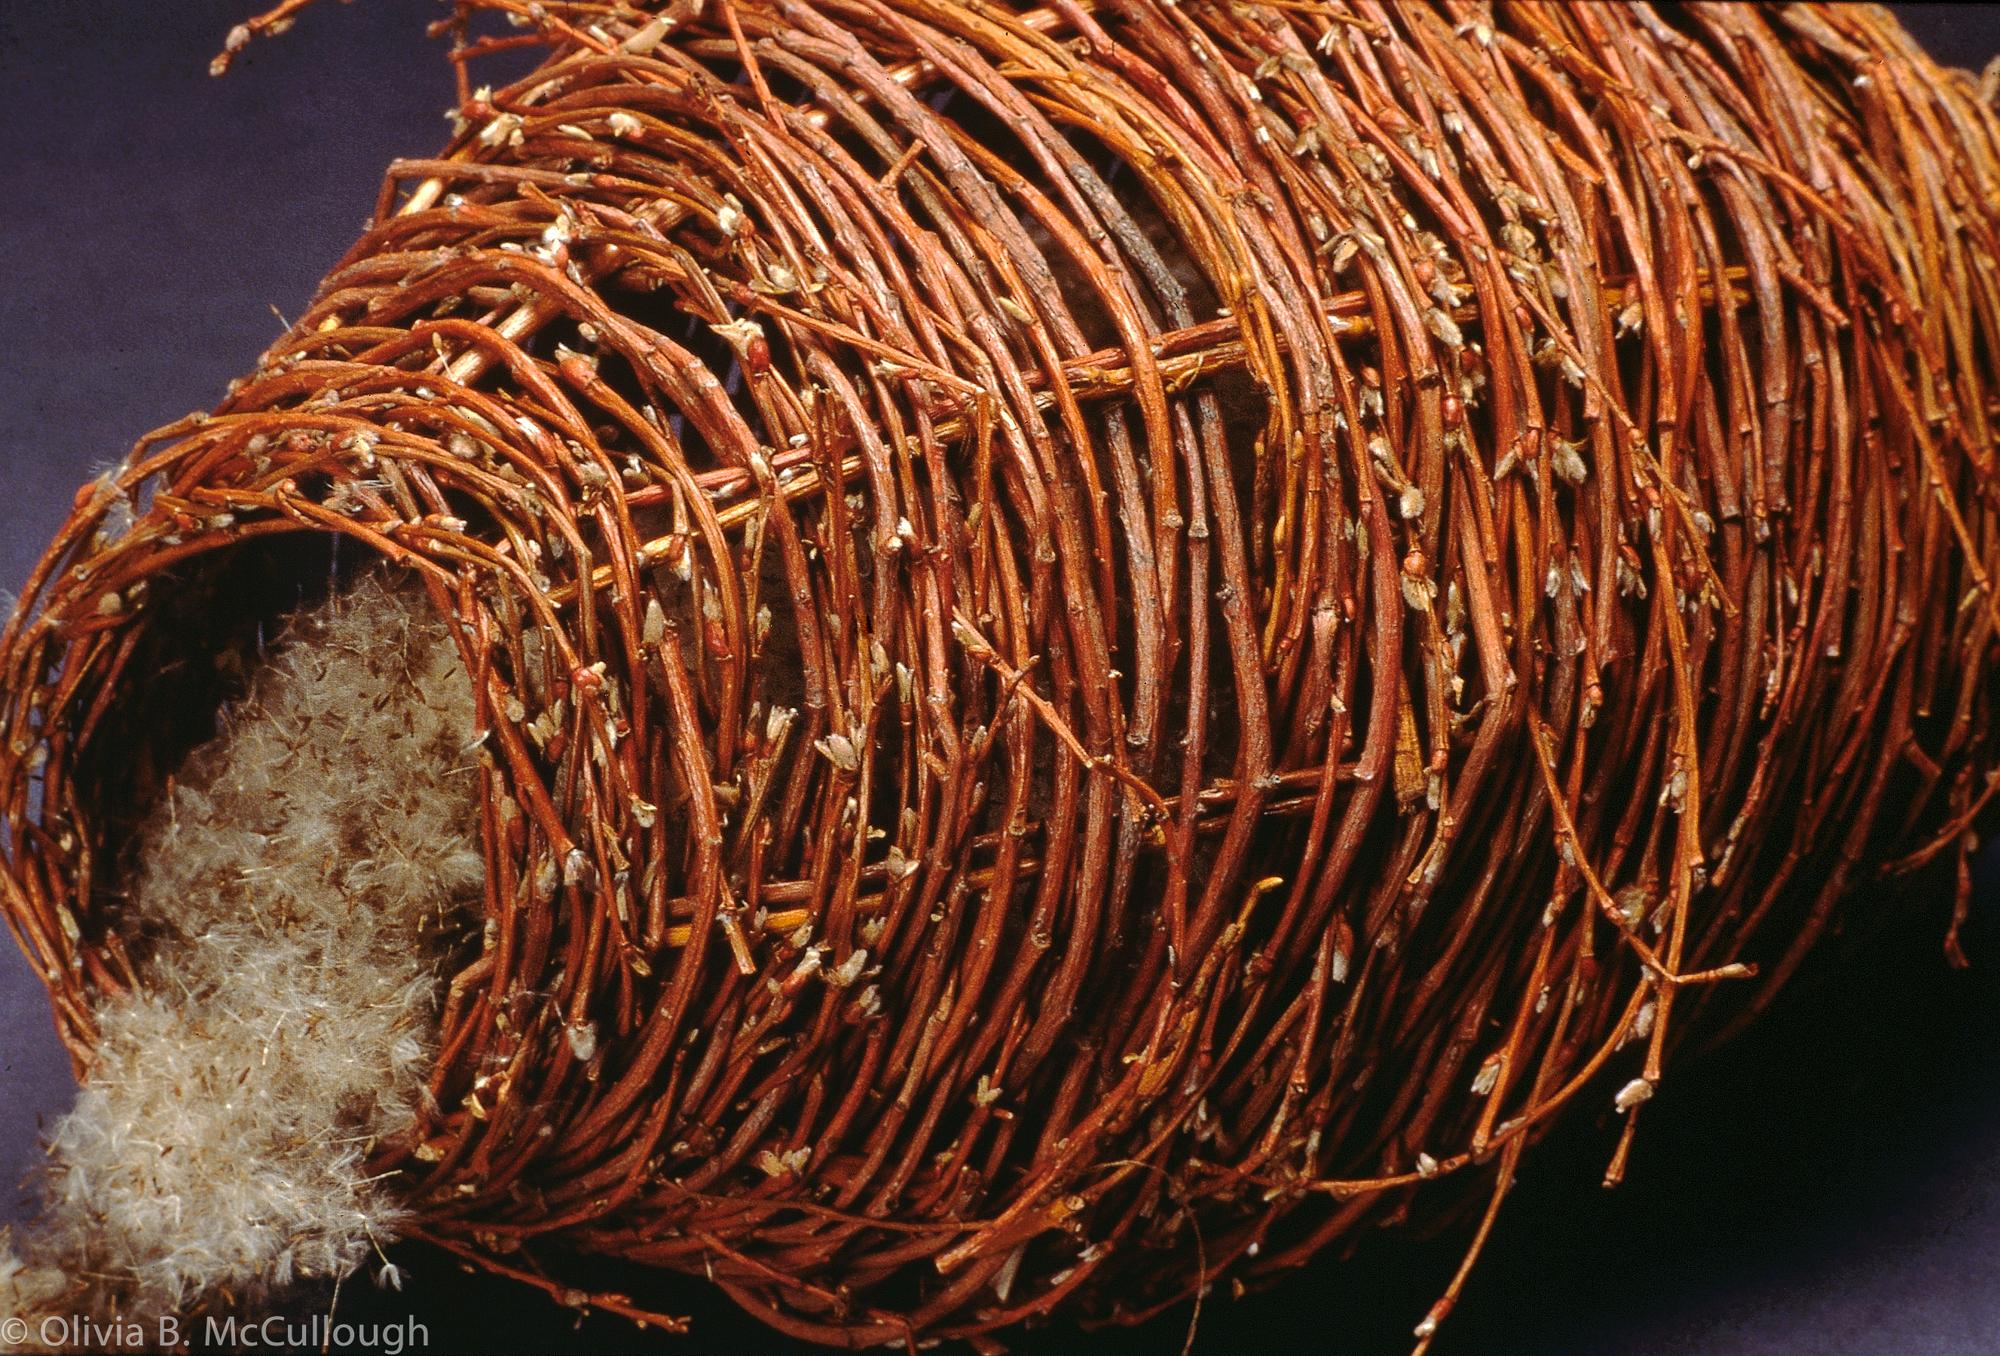 Willow vessel (detail)